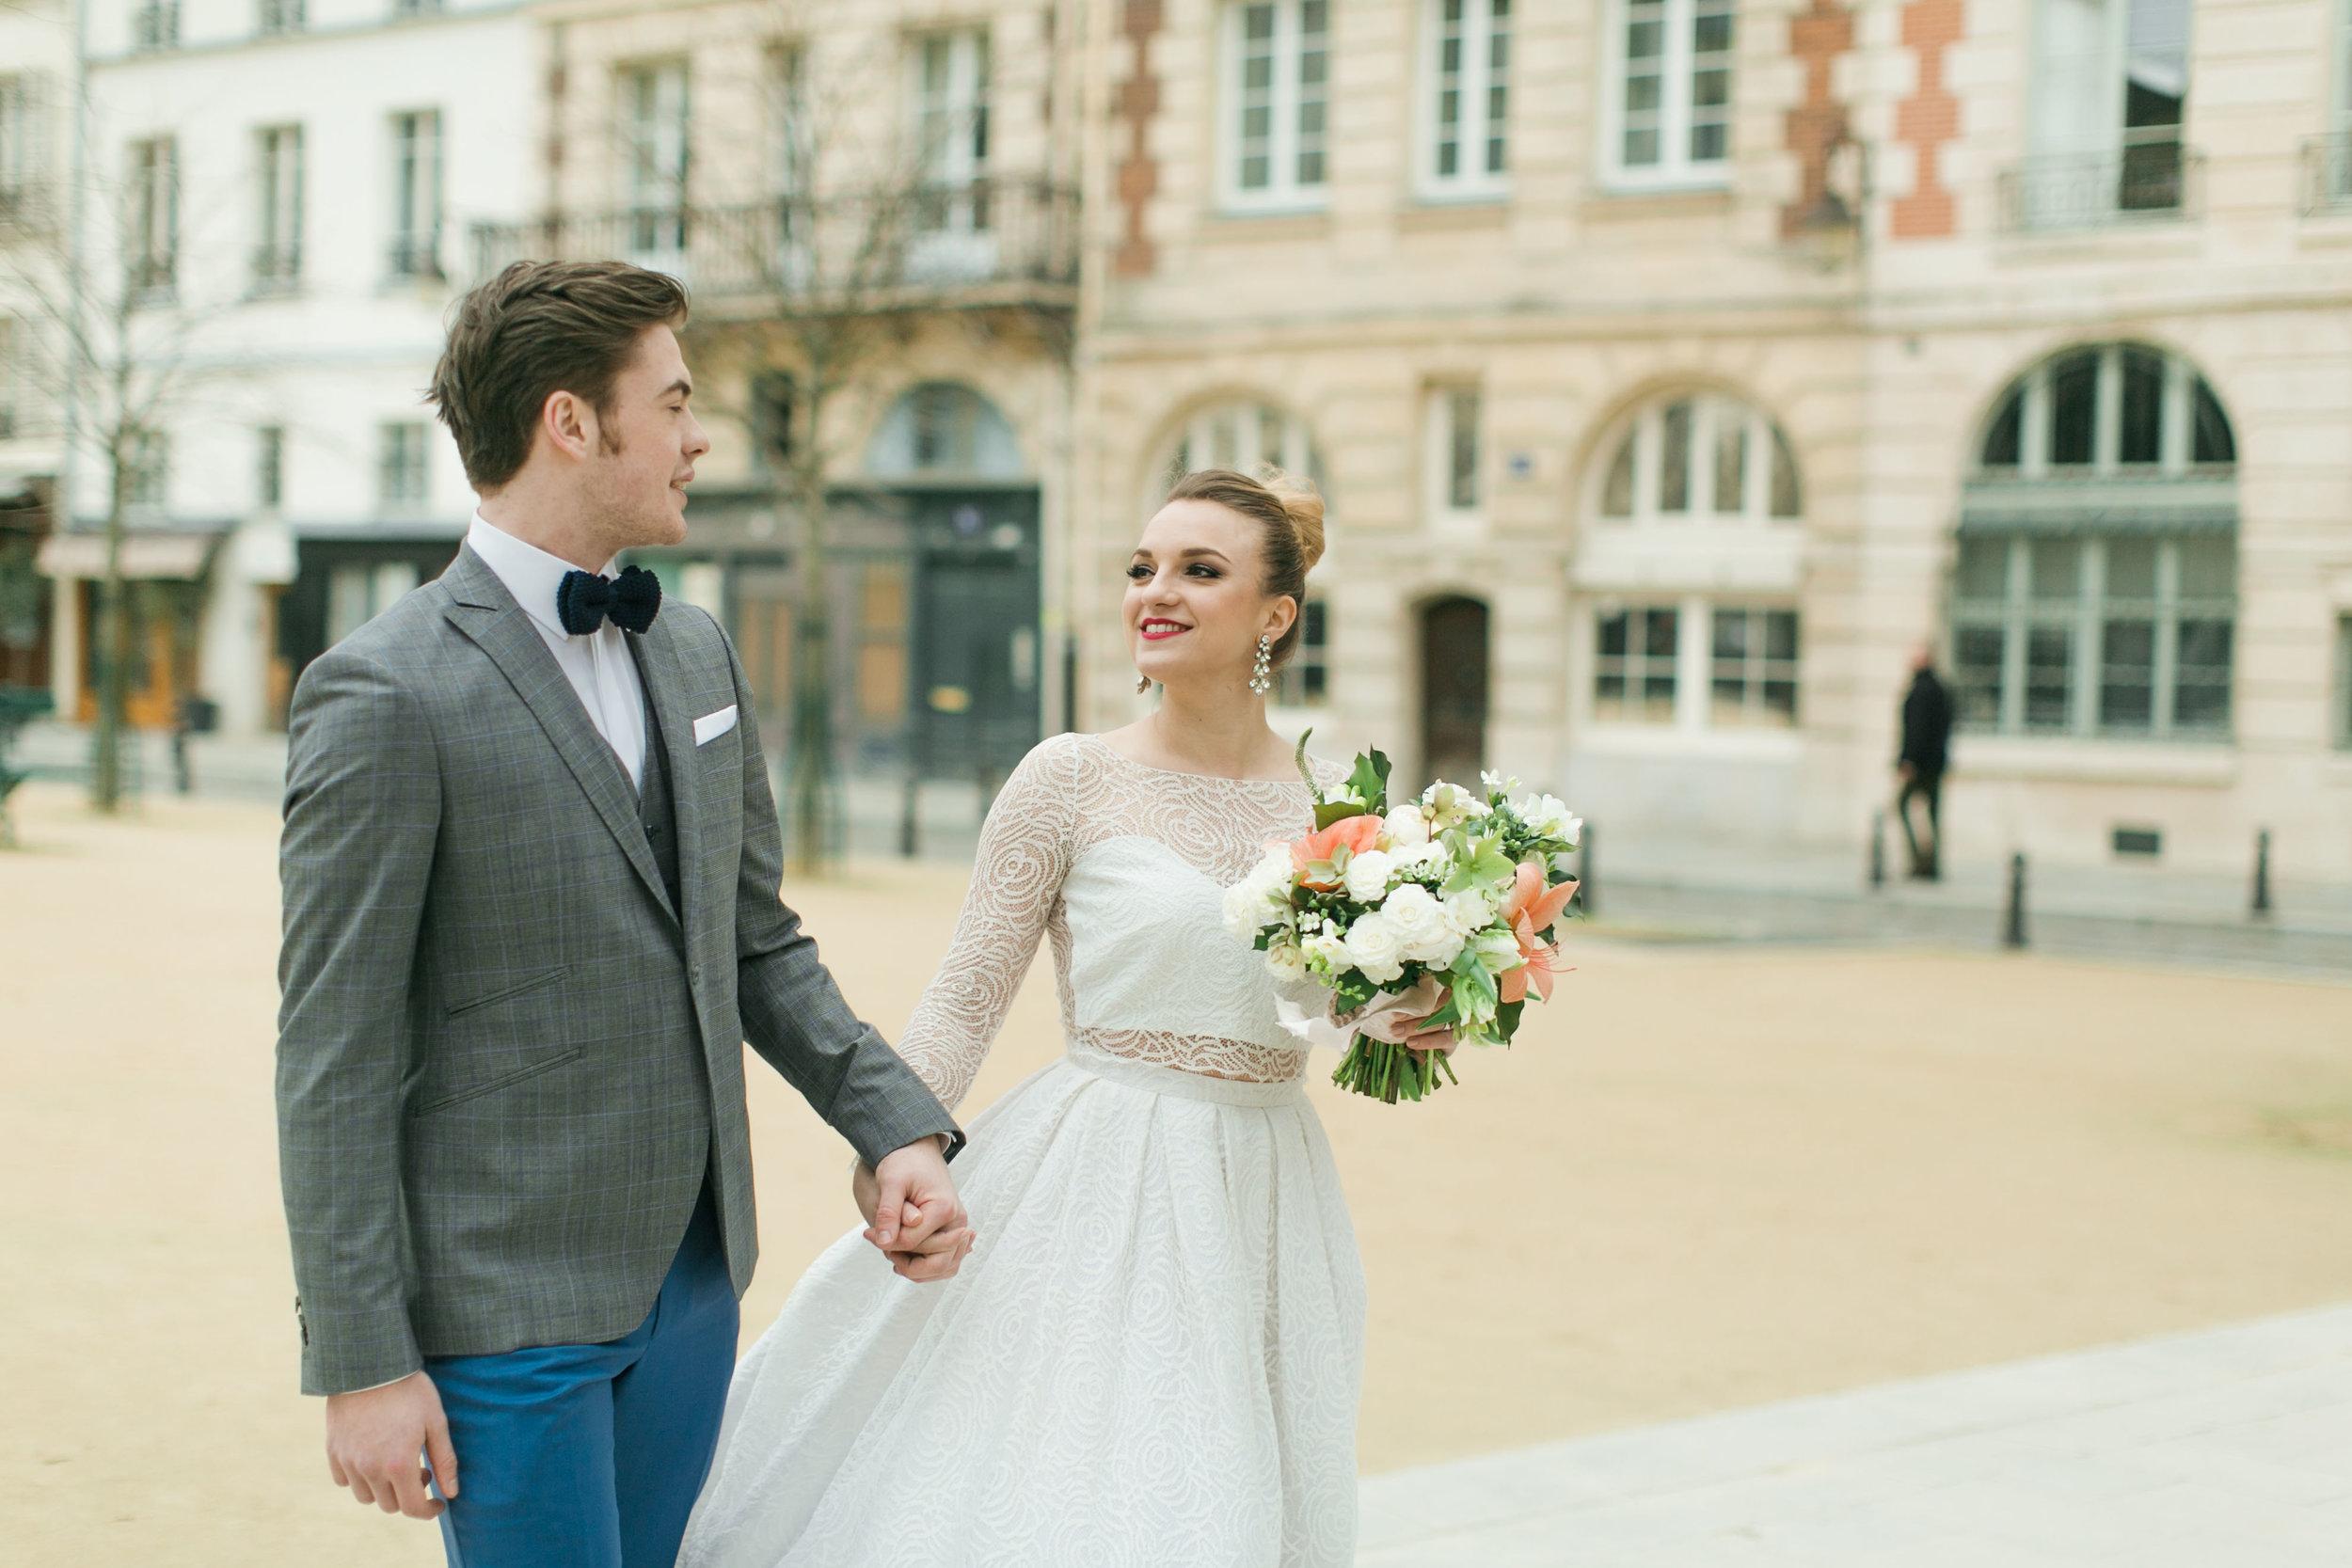 toronto-wedding-photographer-richelle-hunter-photography-new-york-paris-france-inspiration-42.jpg